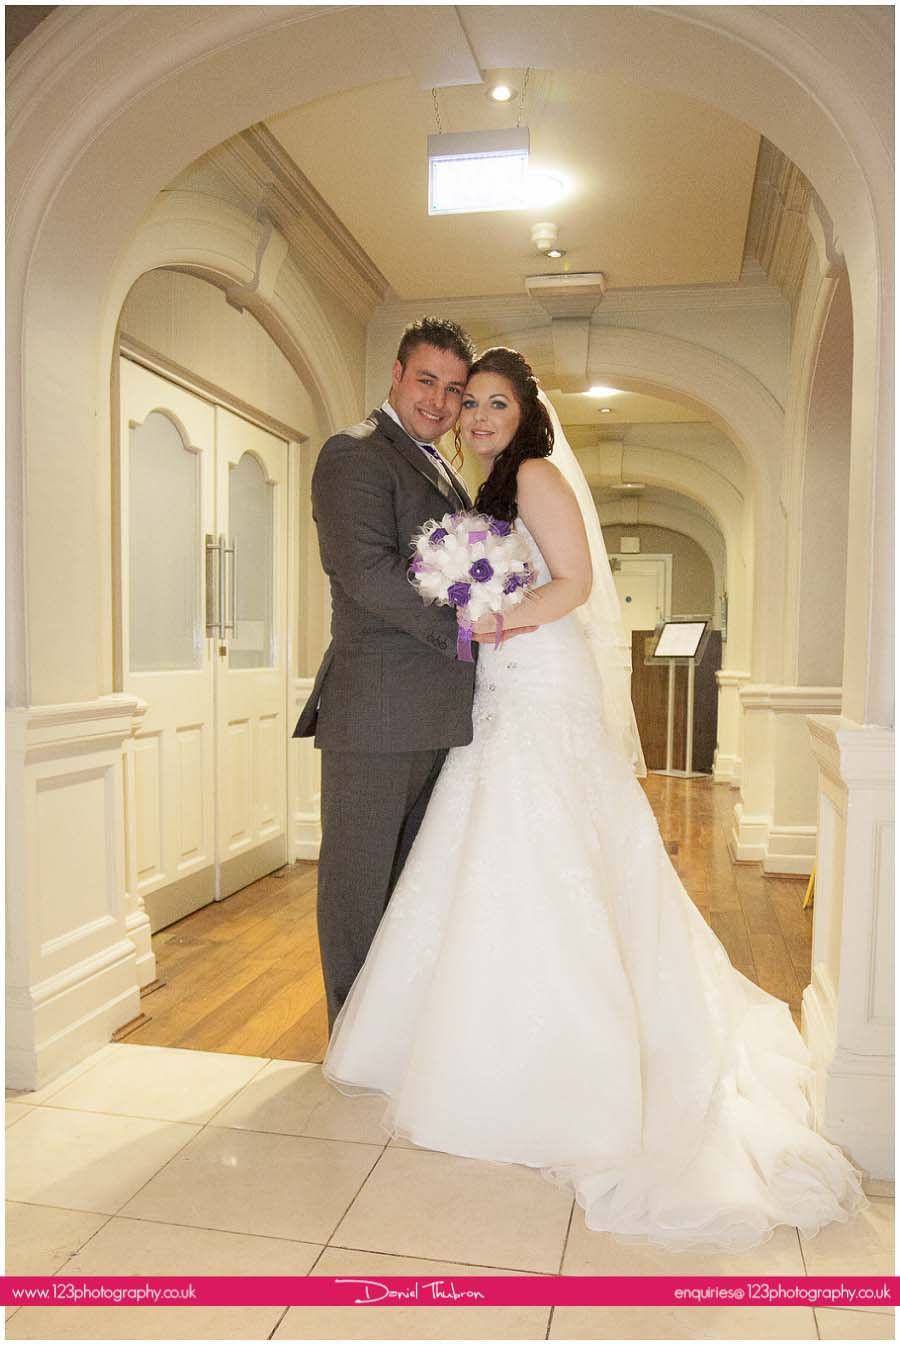 getting married Hotel Metropole Leeds